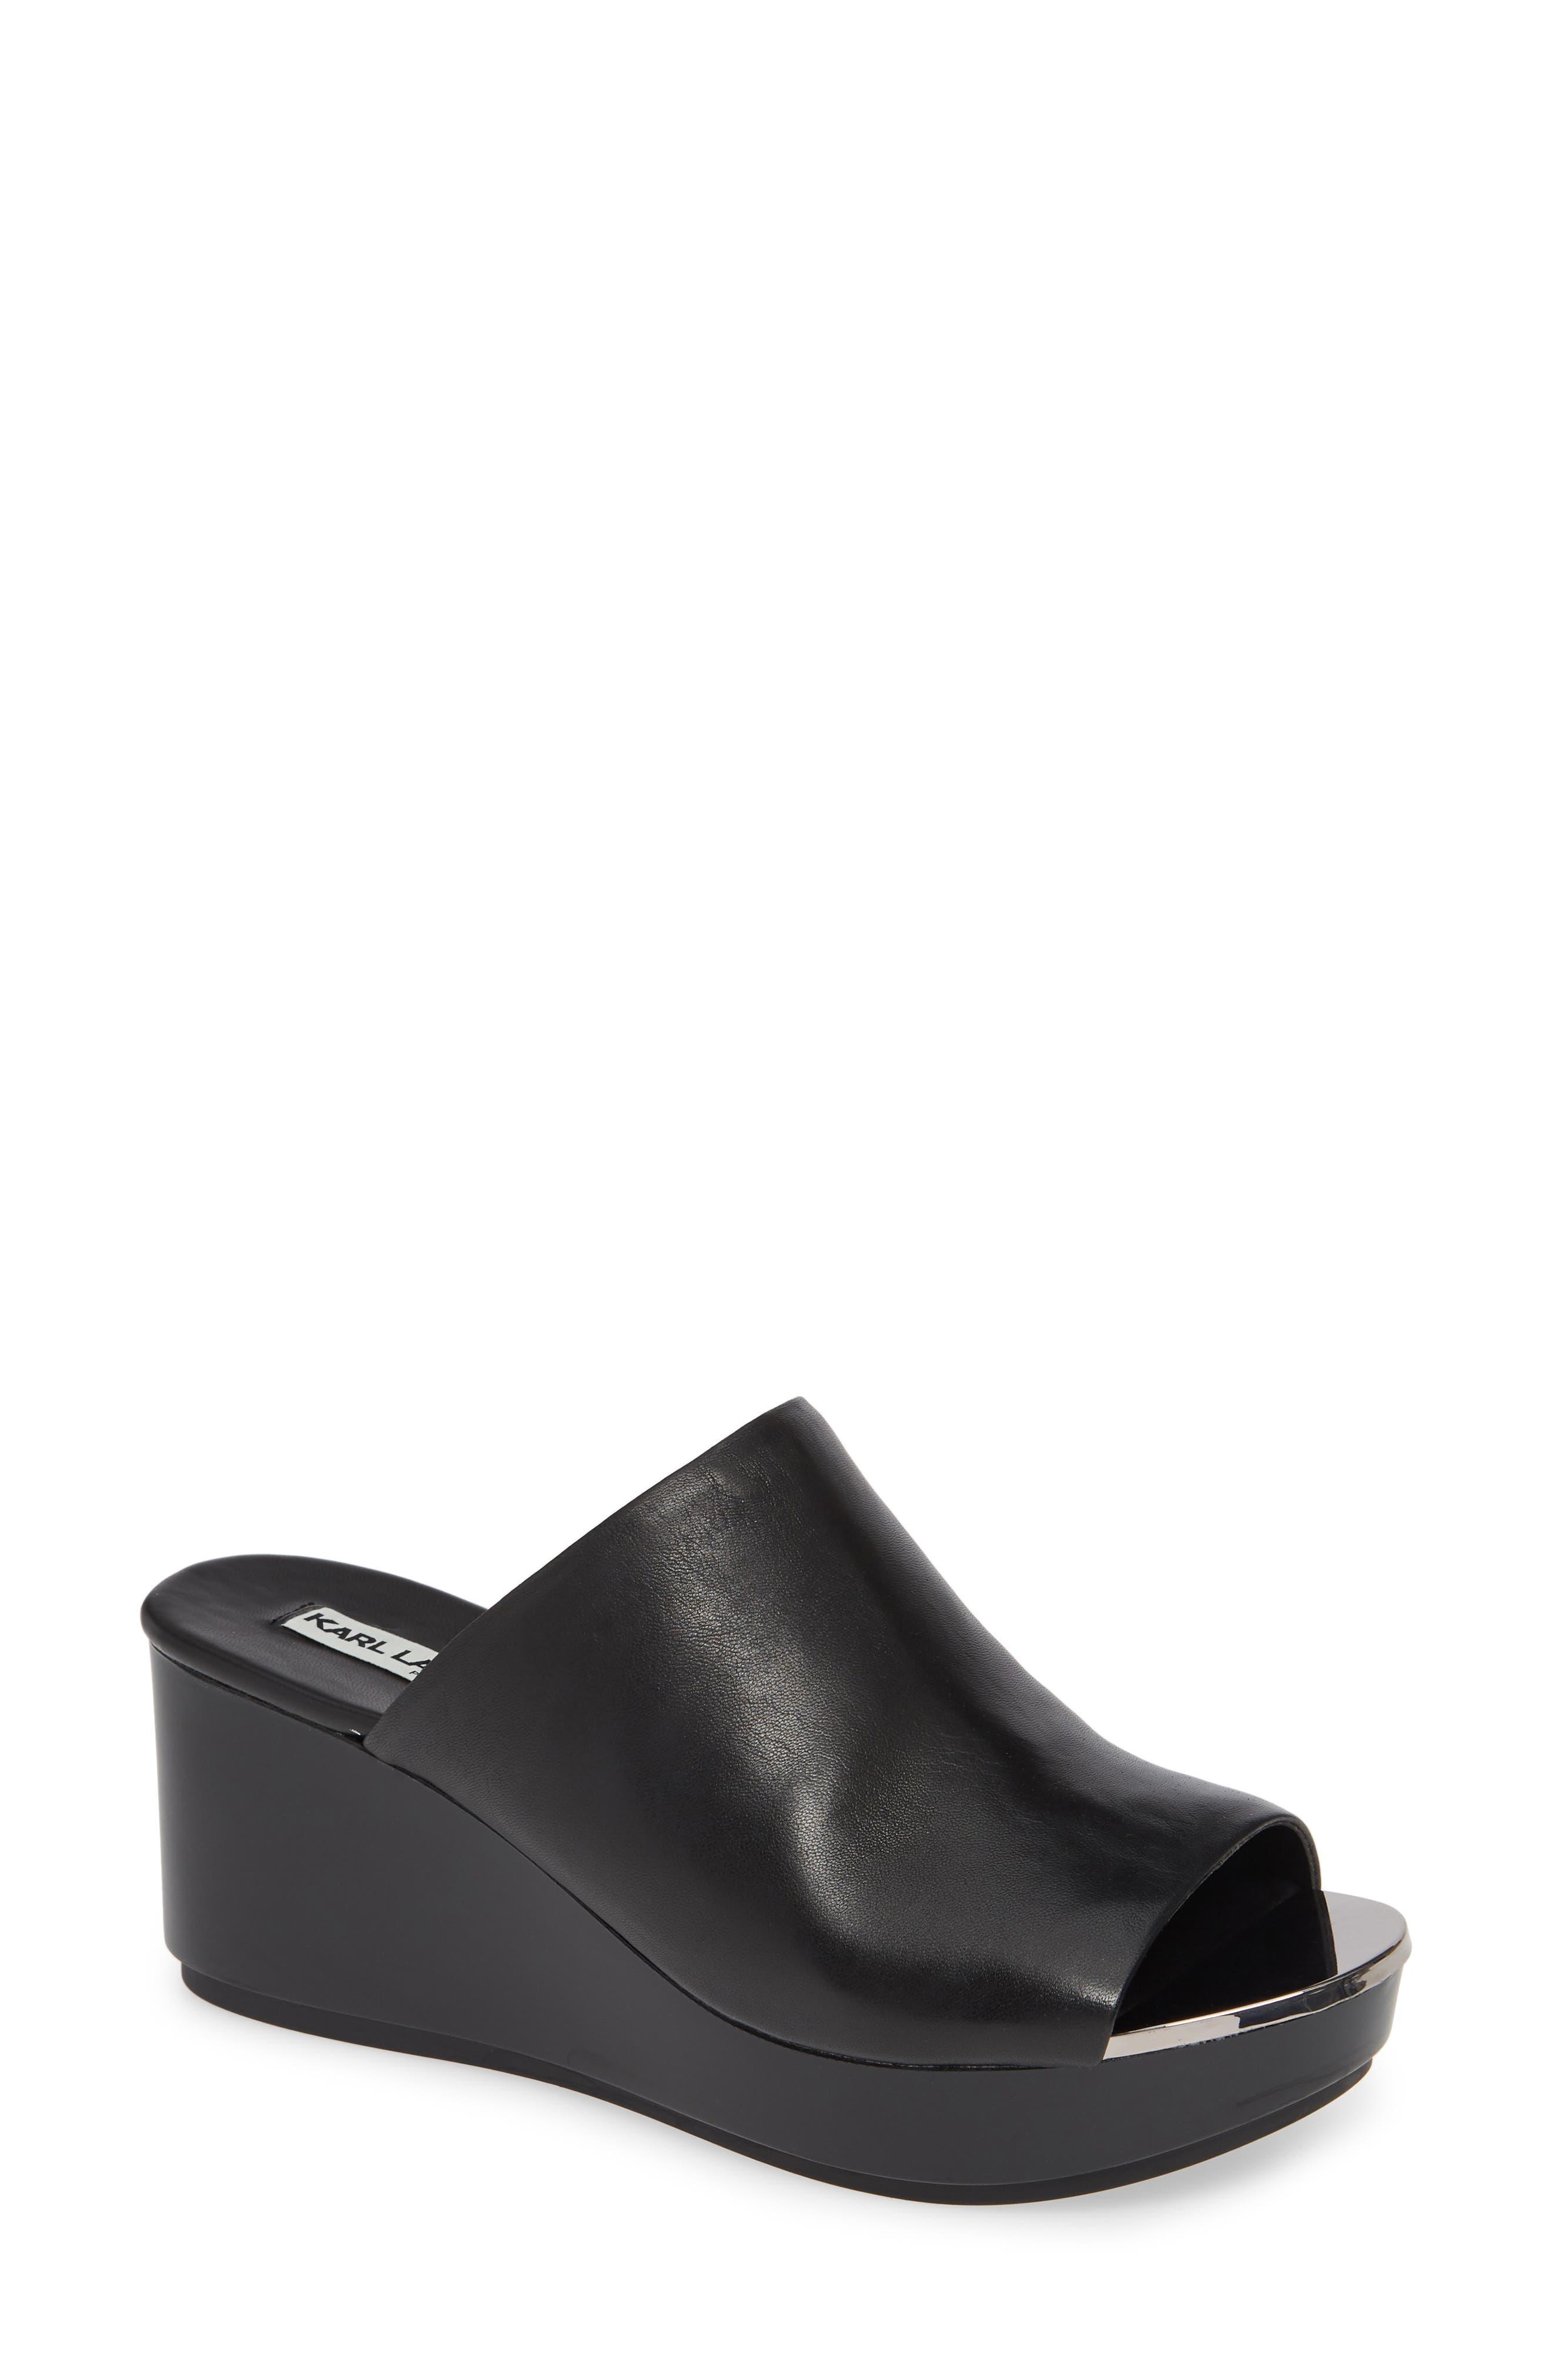 Karl Lagerfeld Paris Lyric Slide Sandal, Black